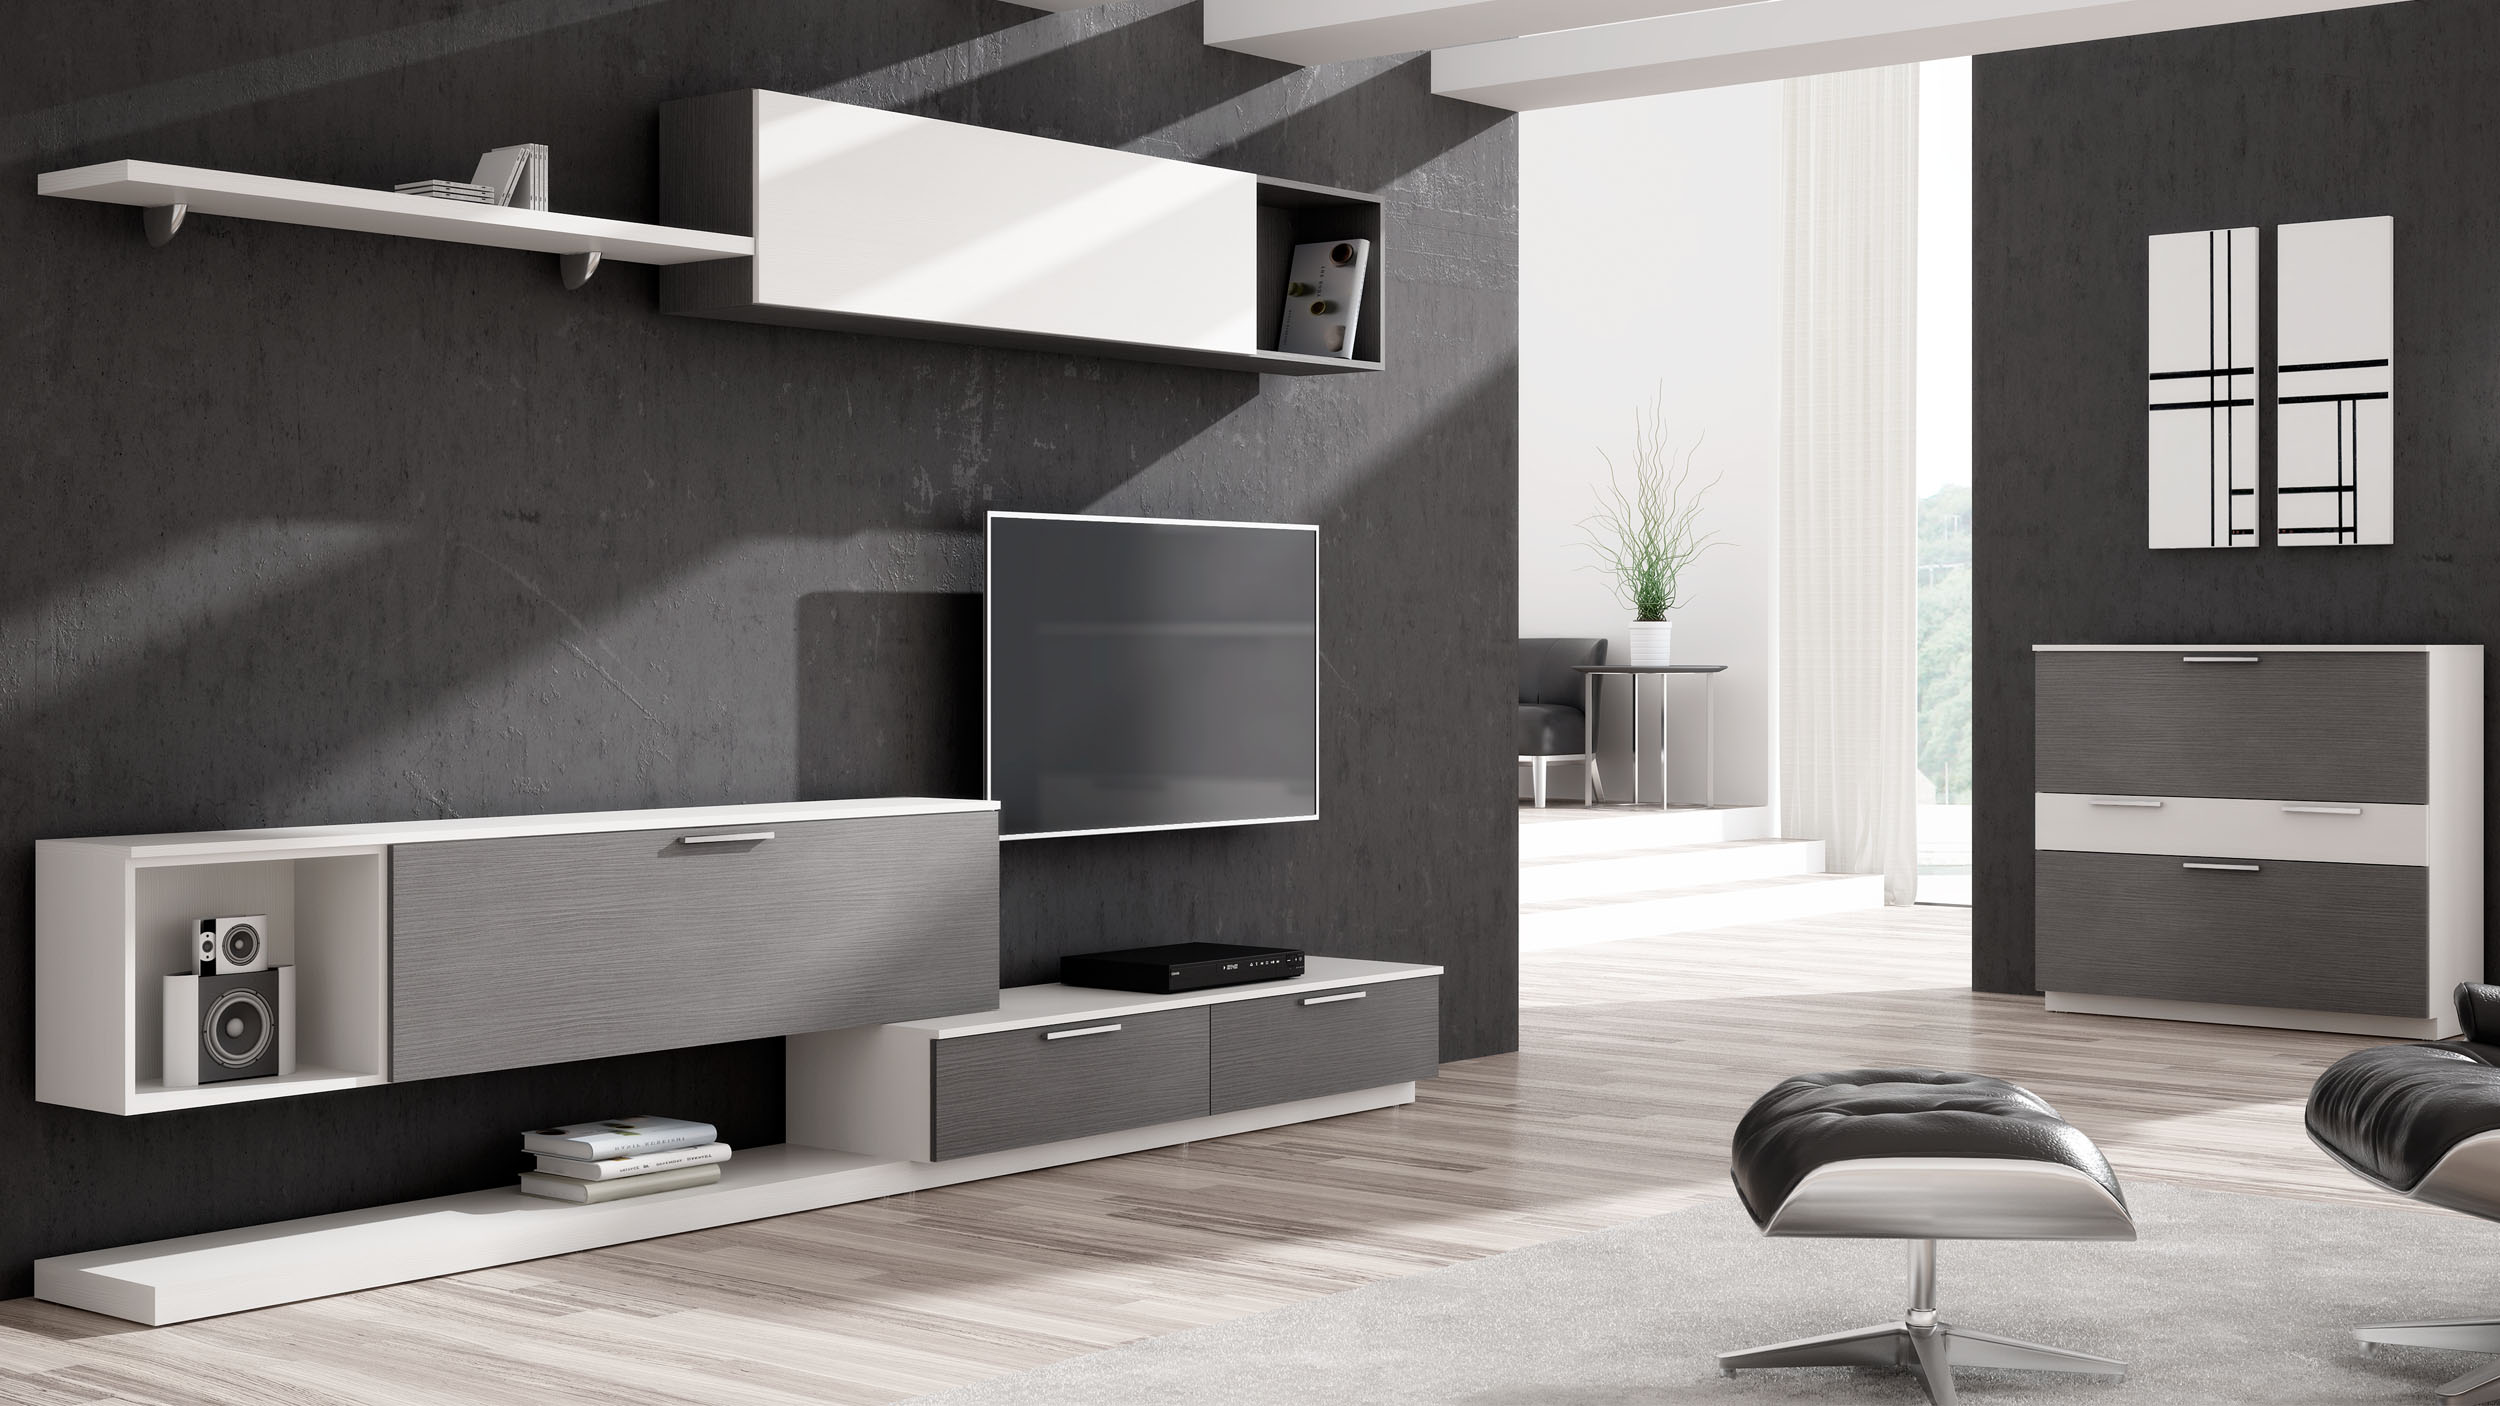 Mueble de sal n ferpi muebles - Mueble ordenador salon ...